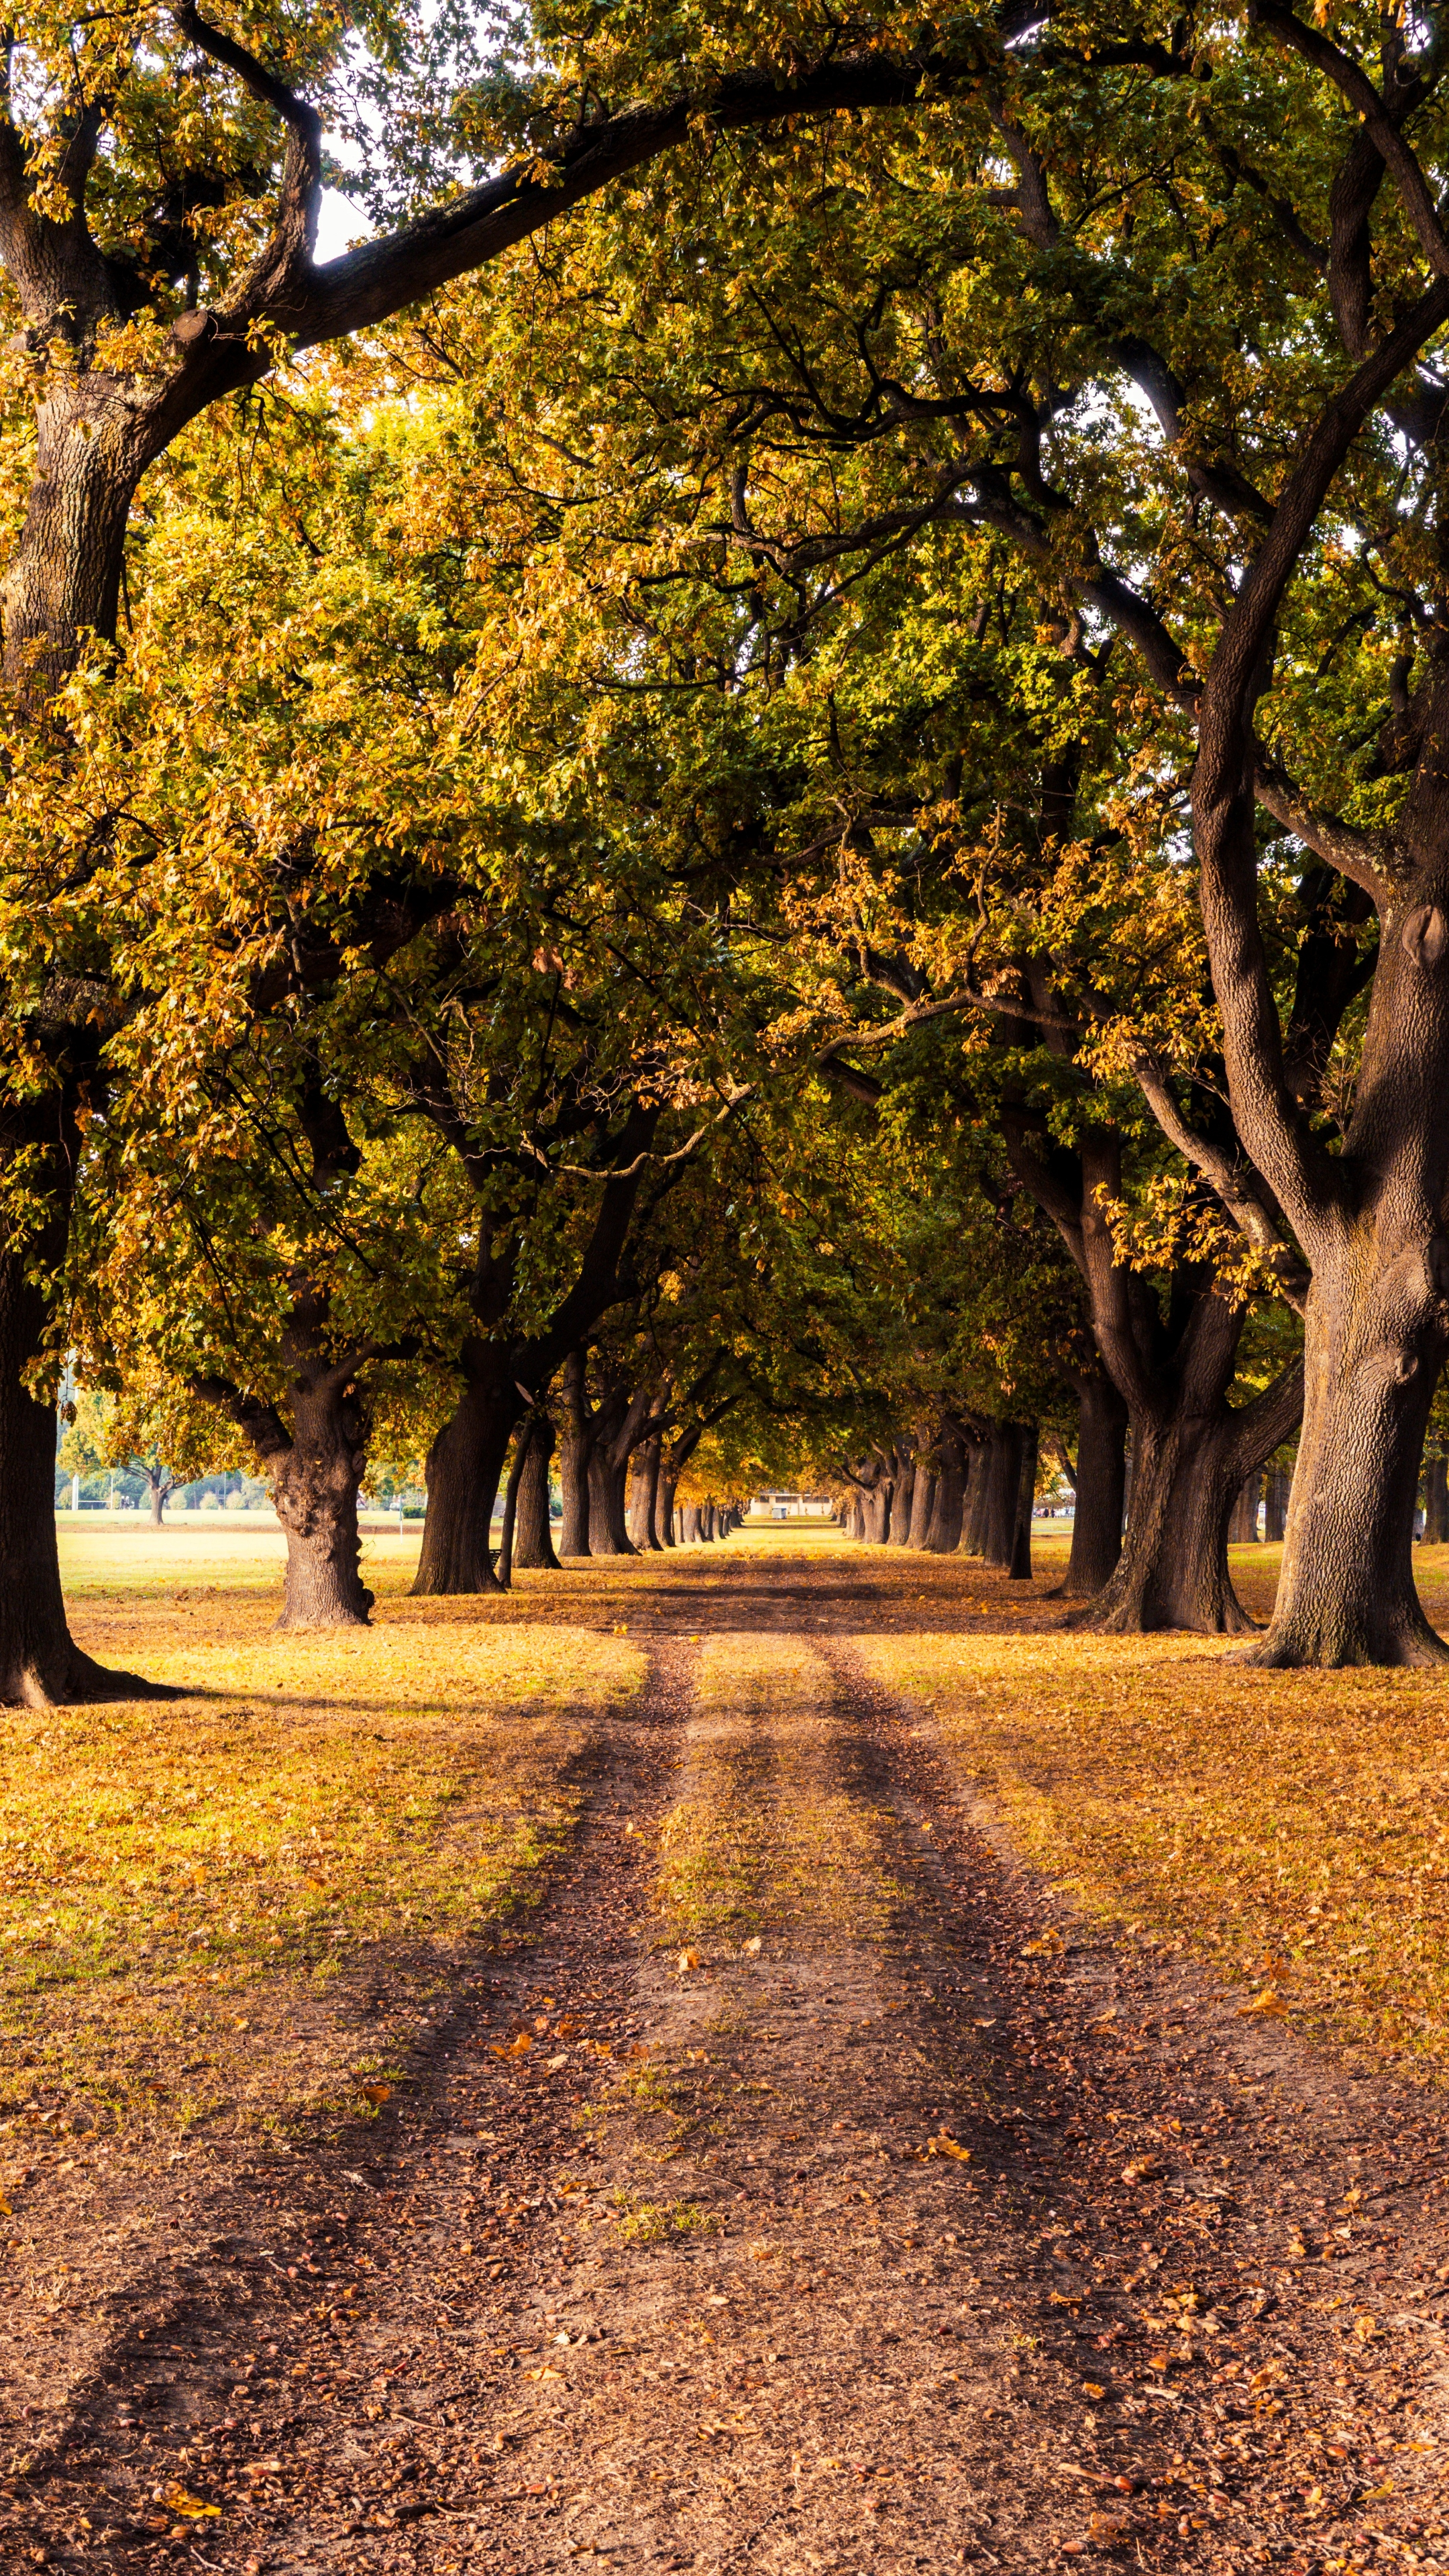 General 2160x3840 New Zealand nature landscape fall